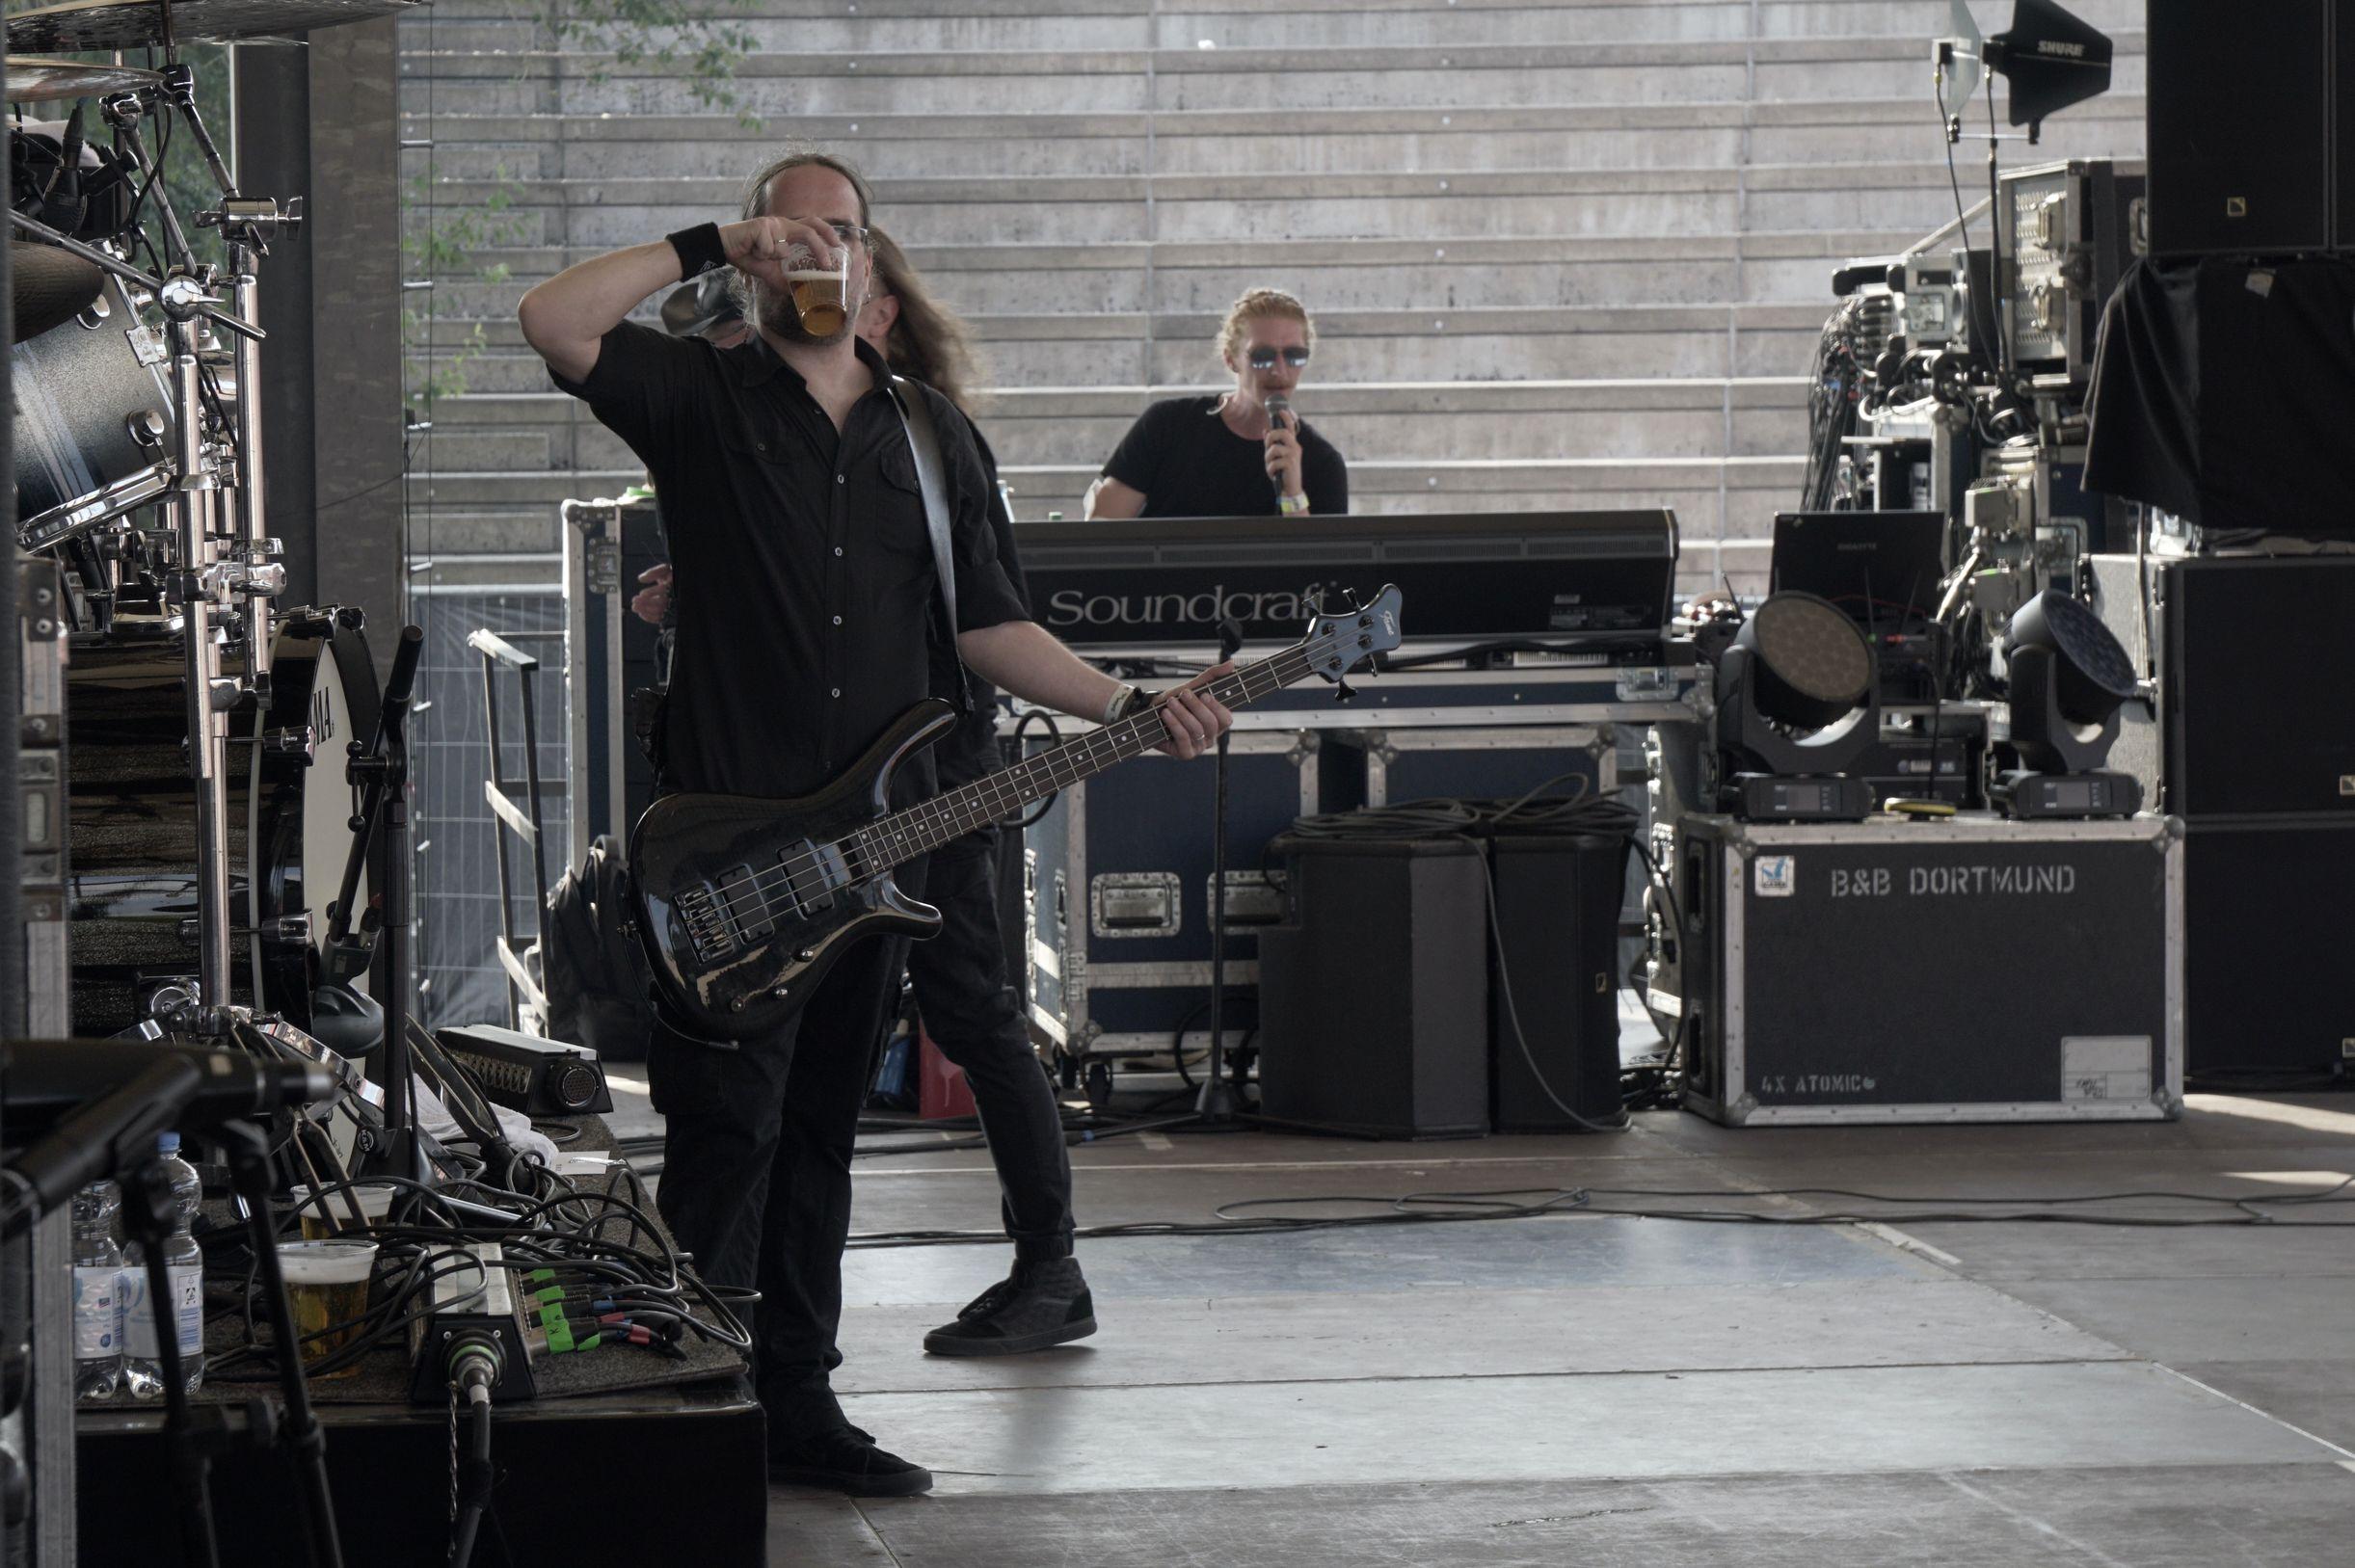 Rock-Hard-Festival-2021-One-Day-The-Very-End-Asphyx-Rage-Motorjesus-Wolfskull-Darkness-Scorched-Oak-Amphitheater-Gelsenkirchen_17